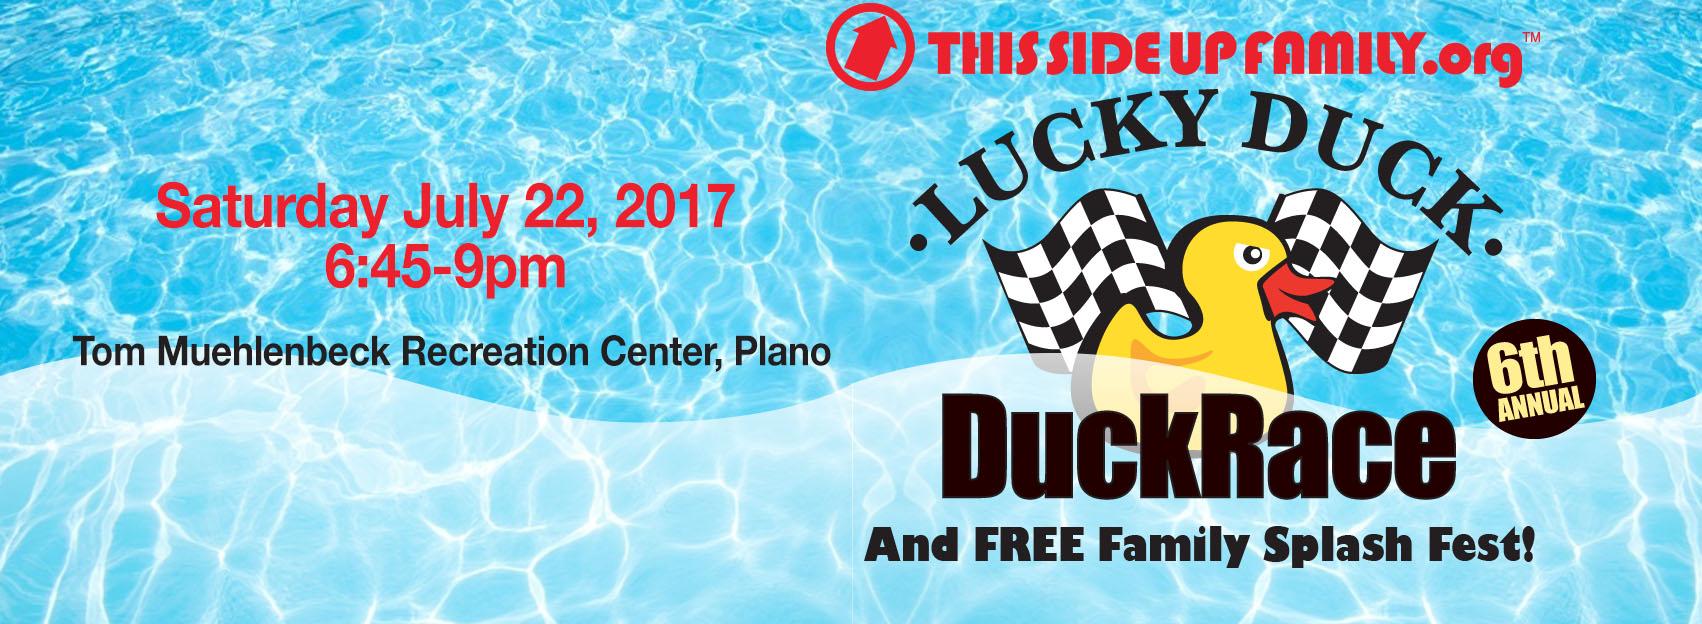 Duck Race 2017 Facebook Banner ad